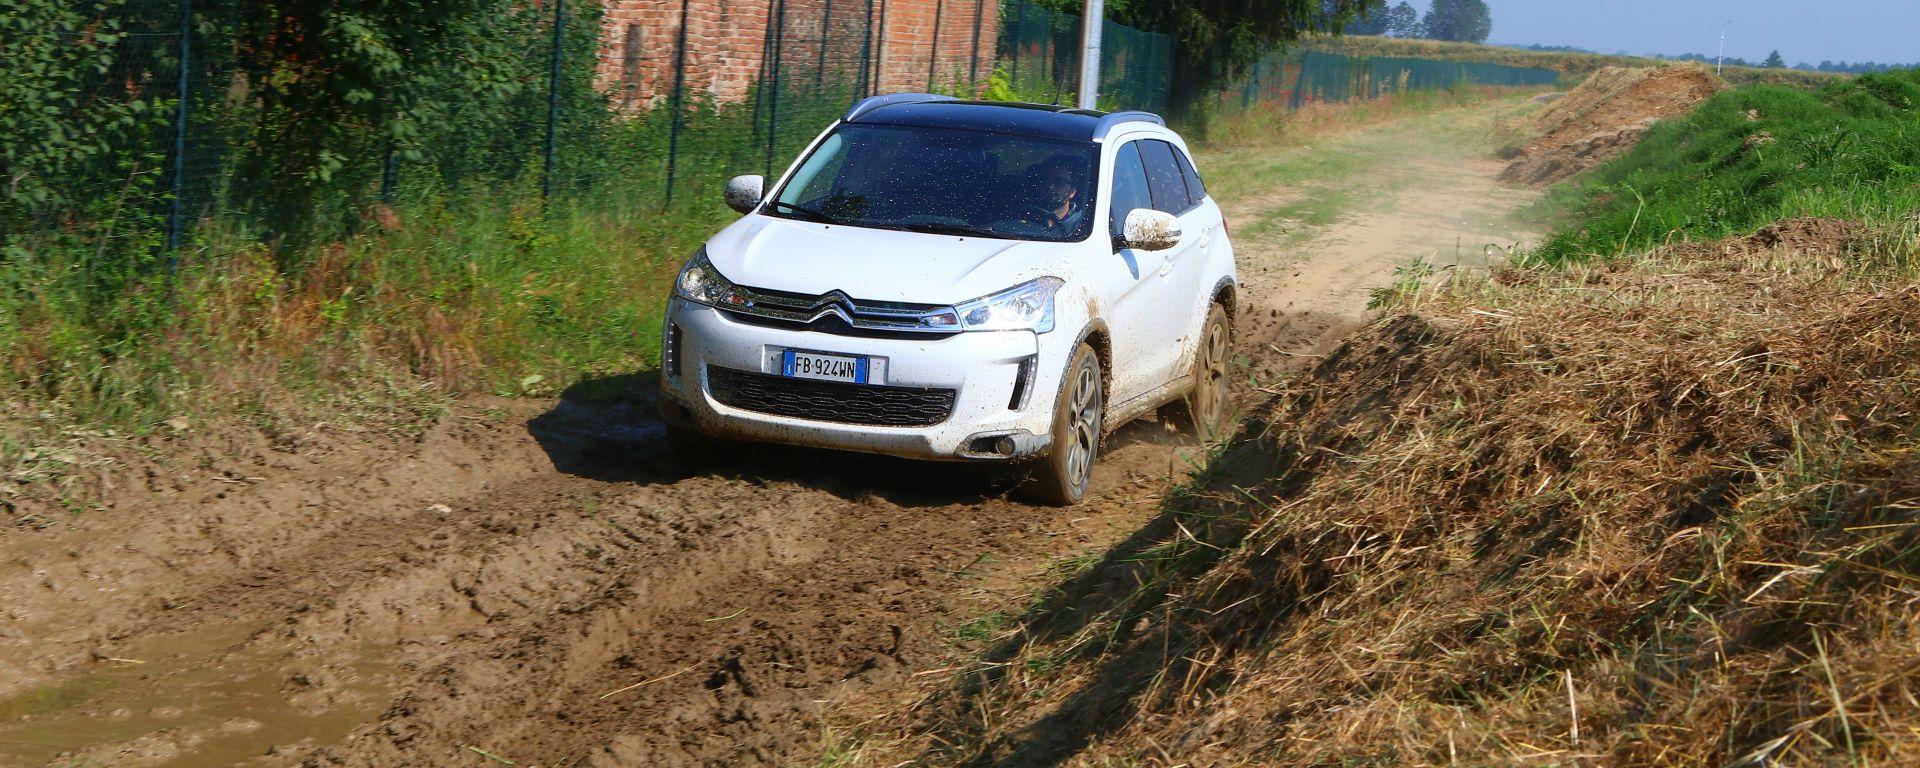 Citroën C4 Aircross: una trasmissione à la carte